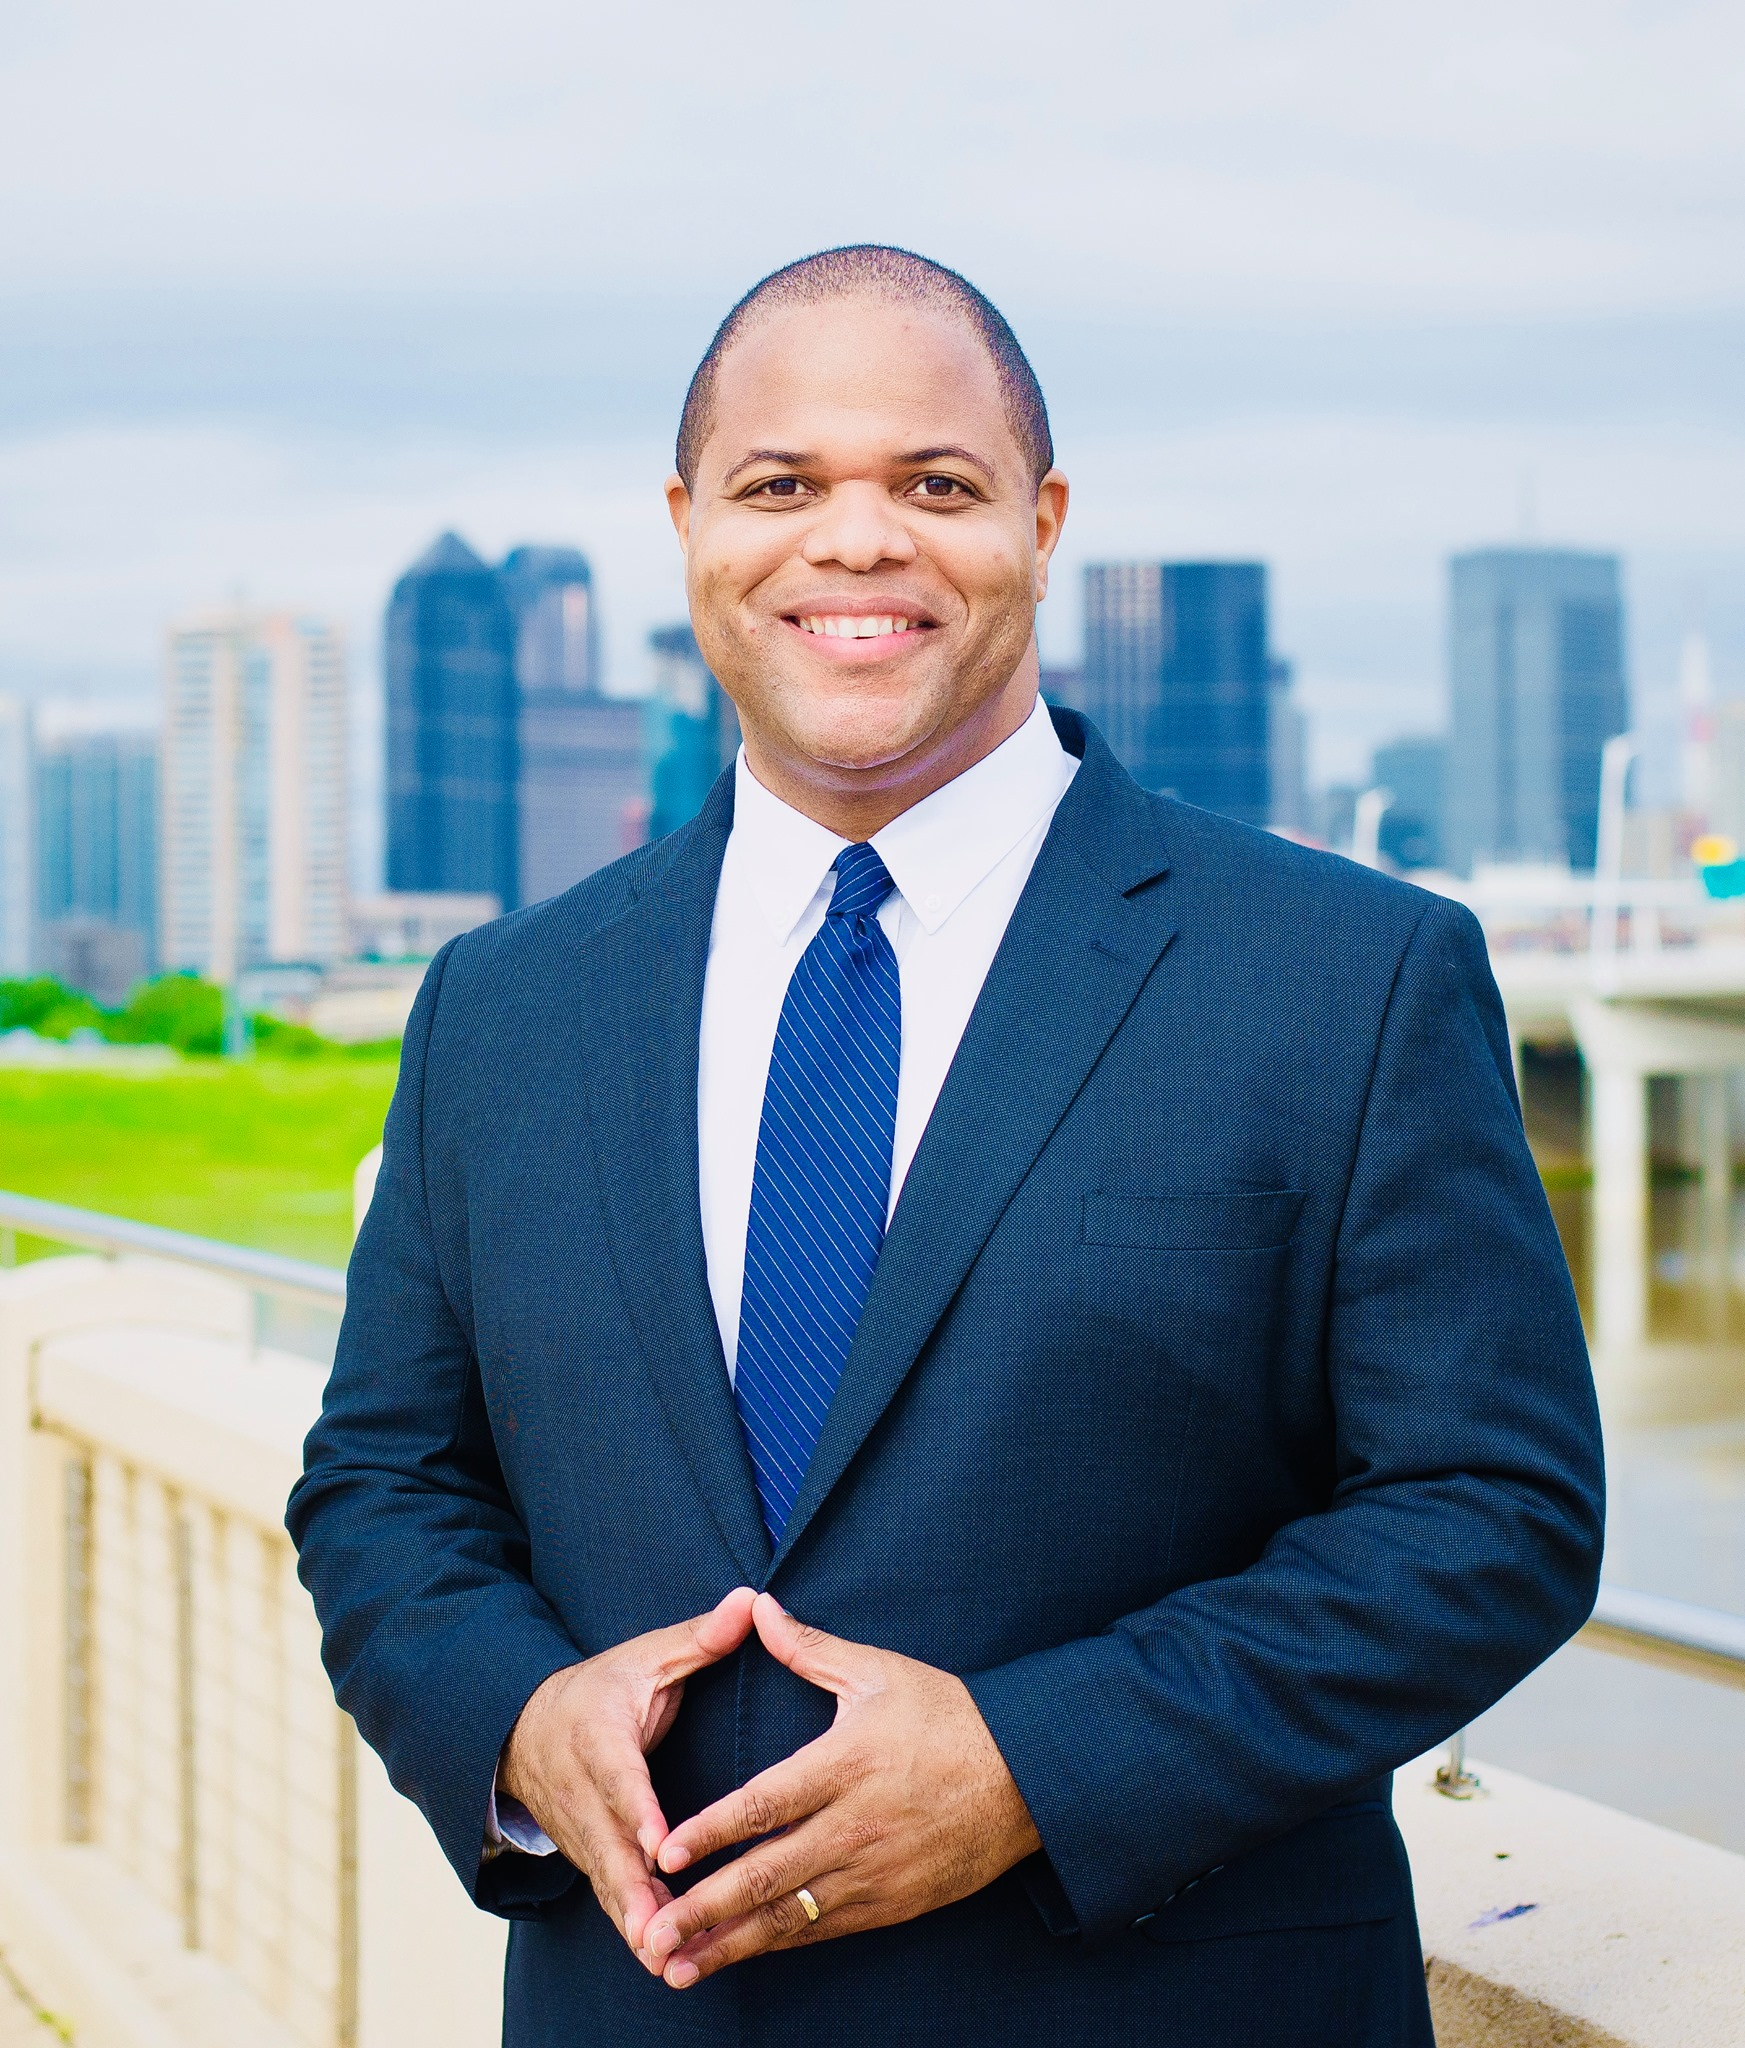 Mayor Eric Johnson Proposes Establishing a New Veterans Affairs Commission